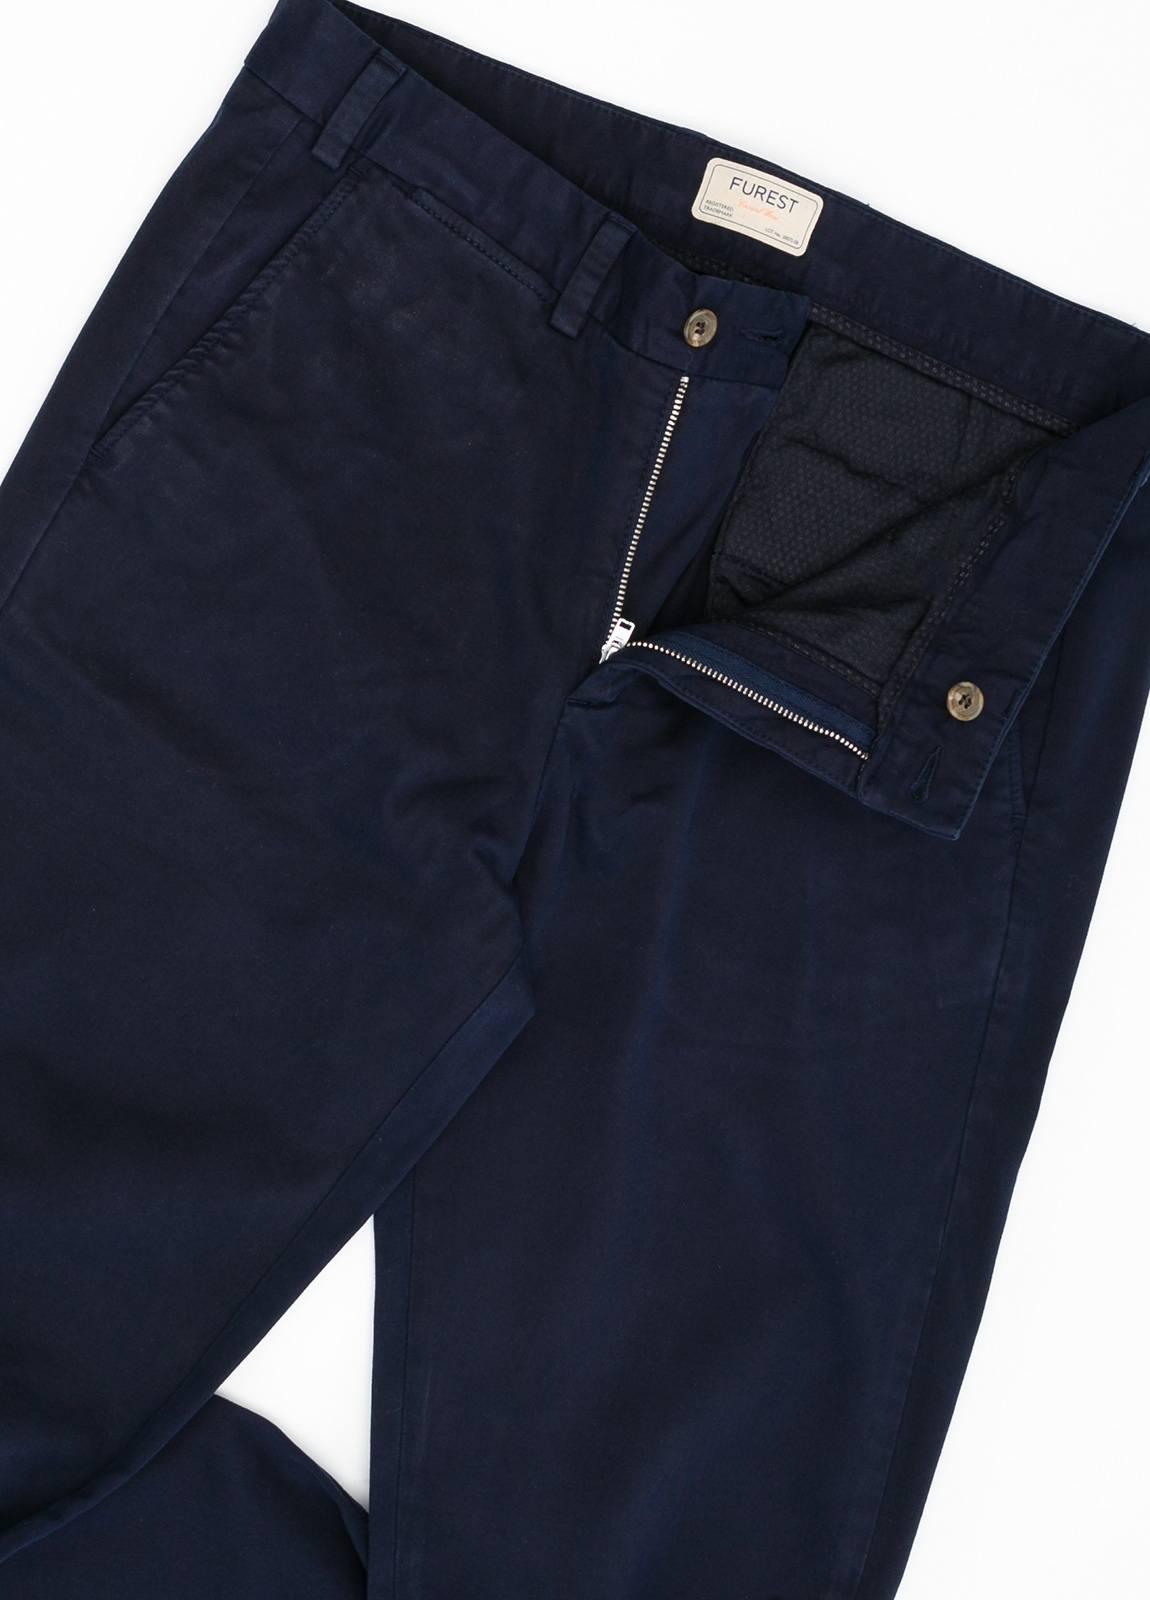 Pantalón Casual Wear, SLIM FIT micro textura color azul marino, 98% Algodón 2% Elastano. - Ítem2